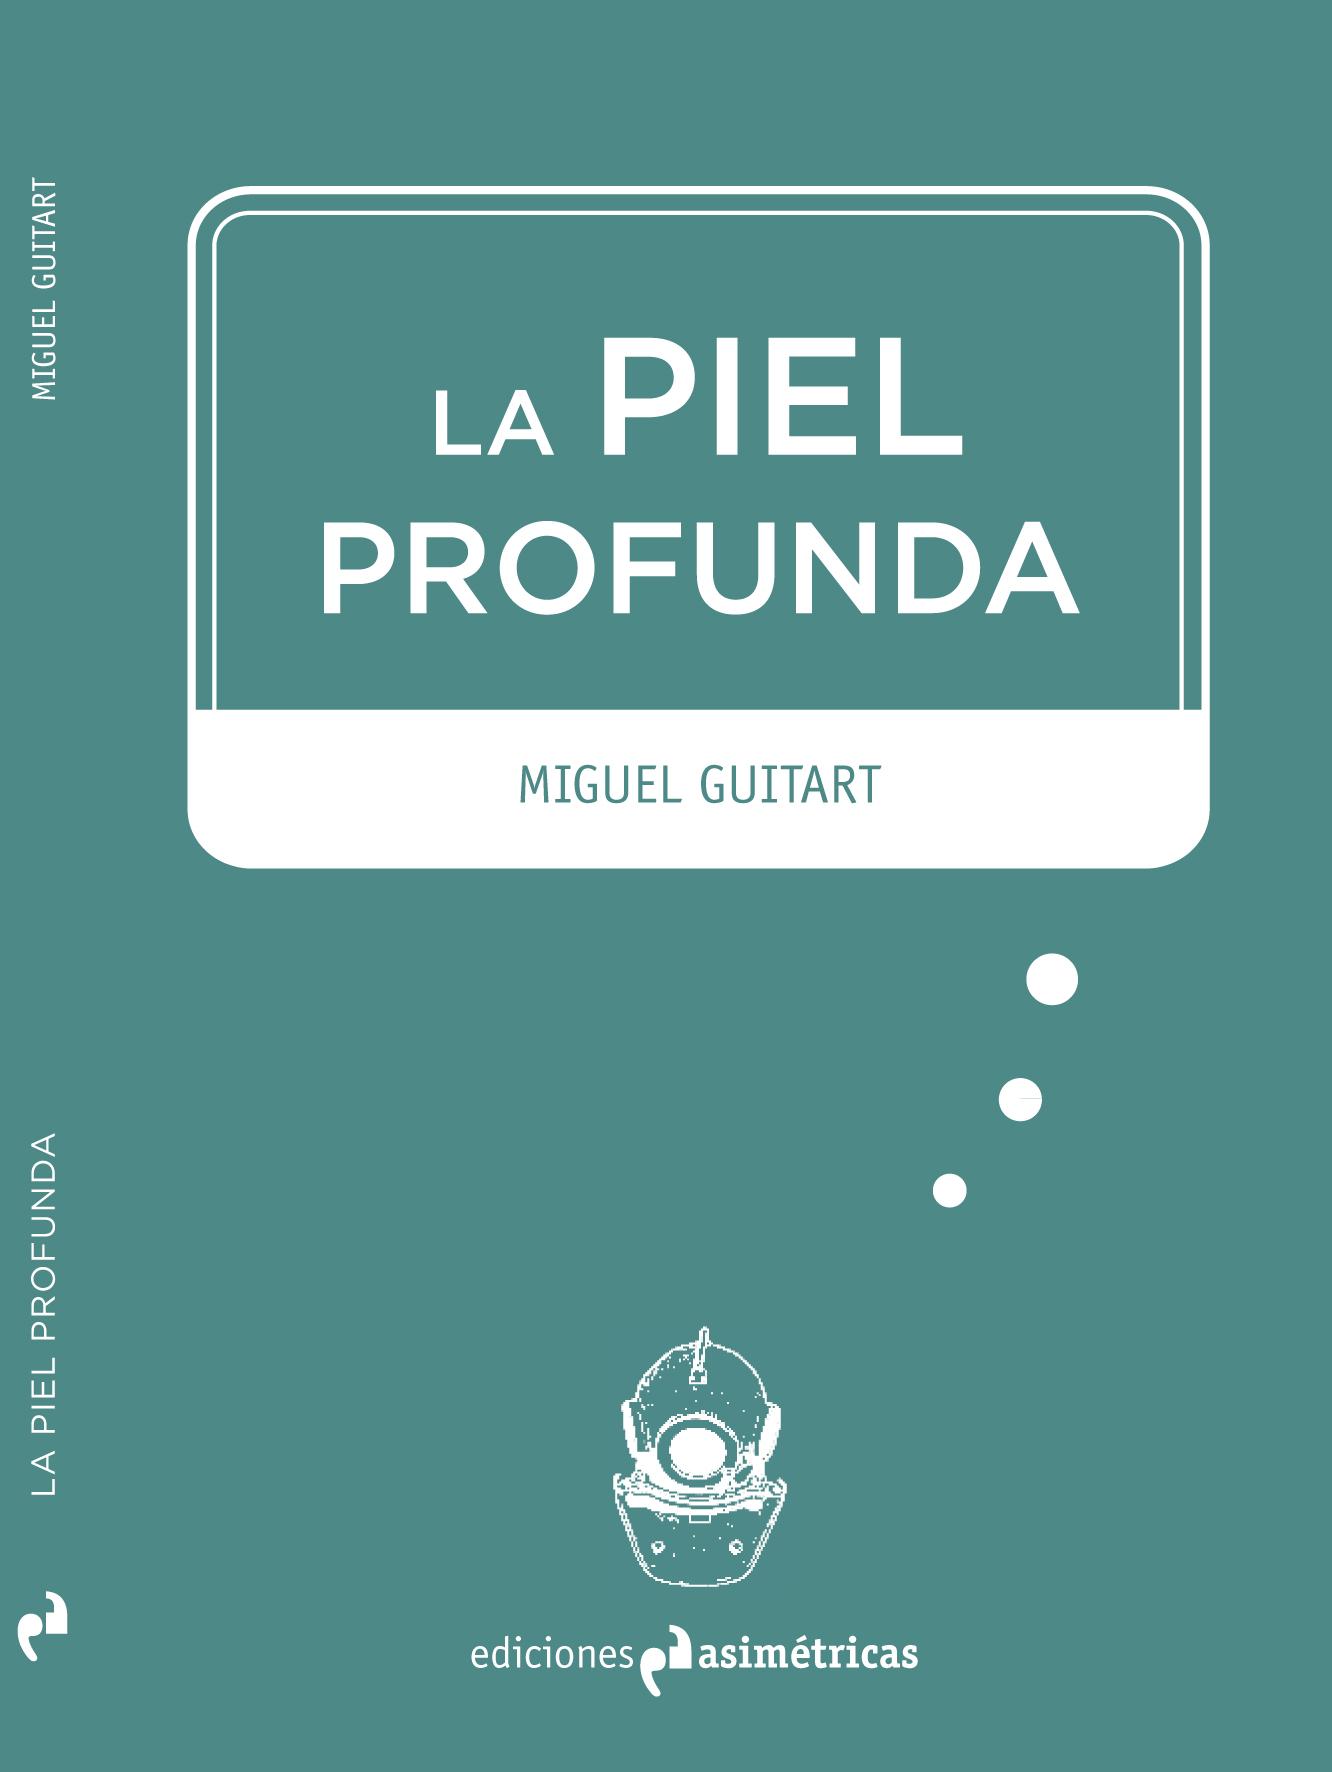 Miguel Guitart_La piel Profunda.jpg